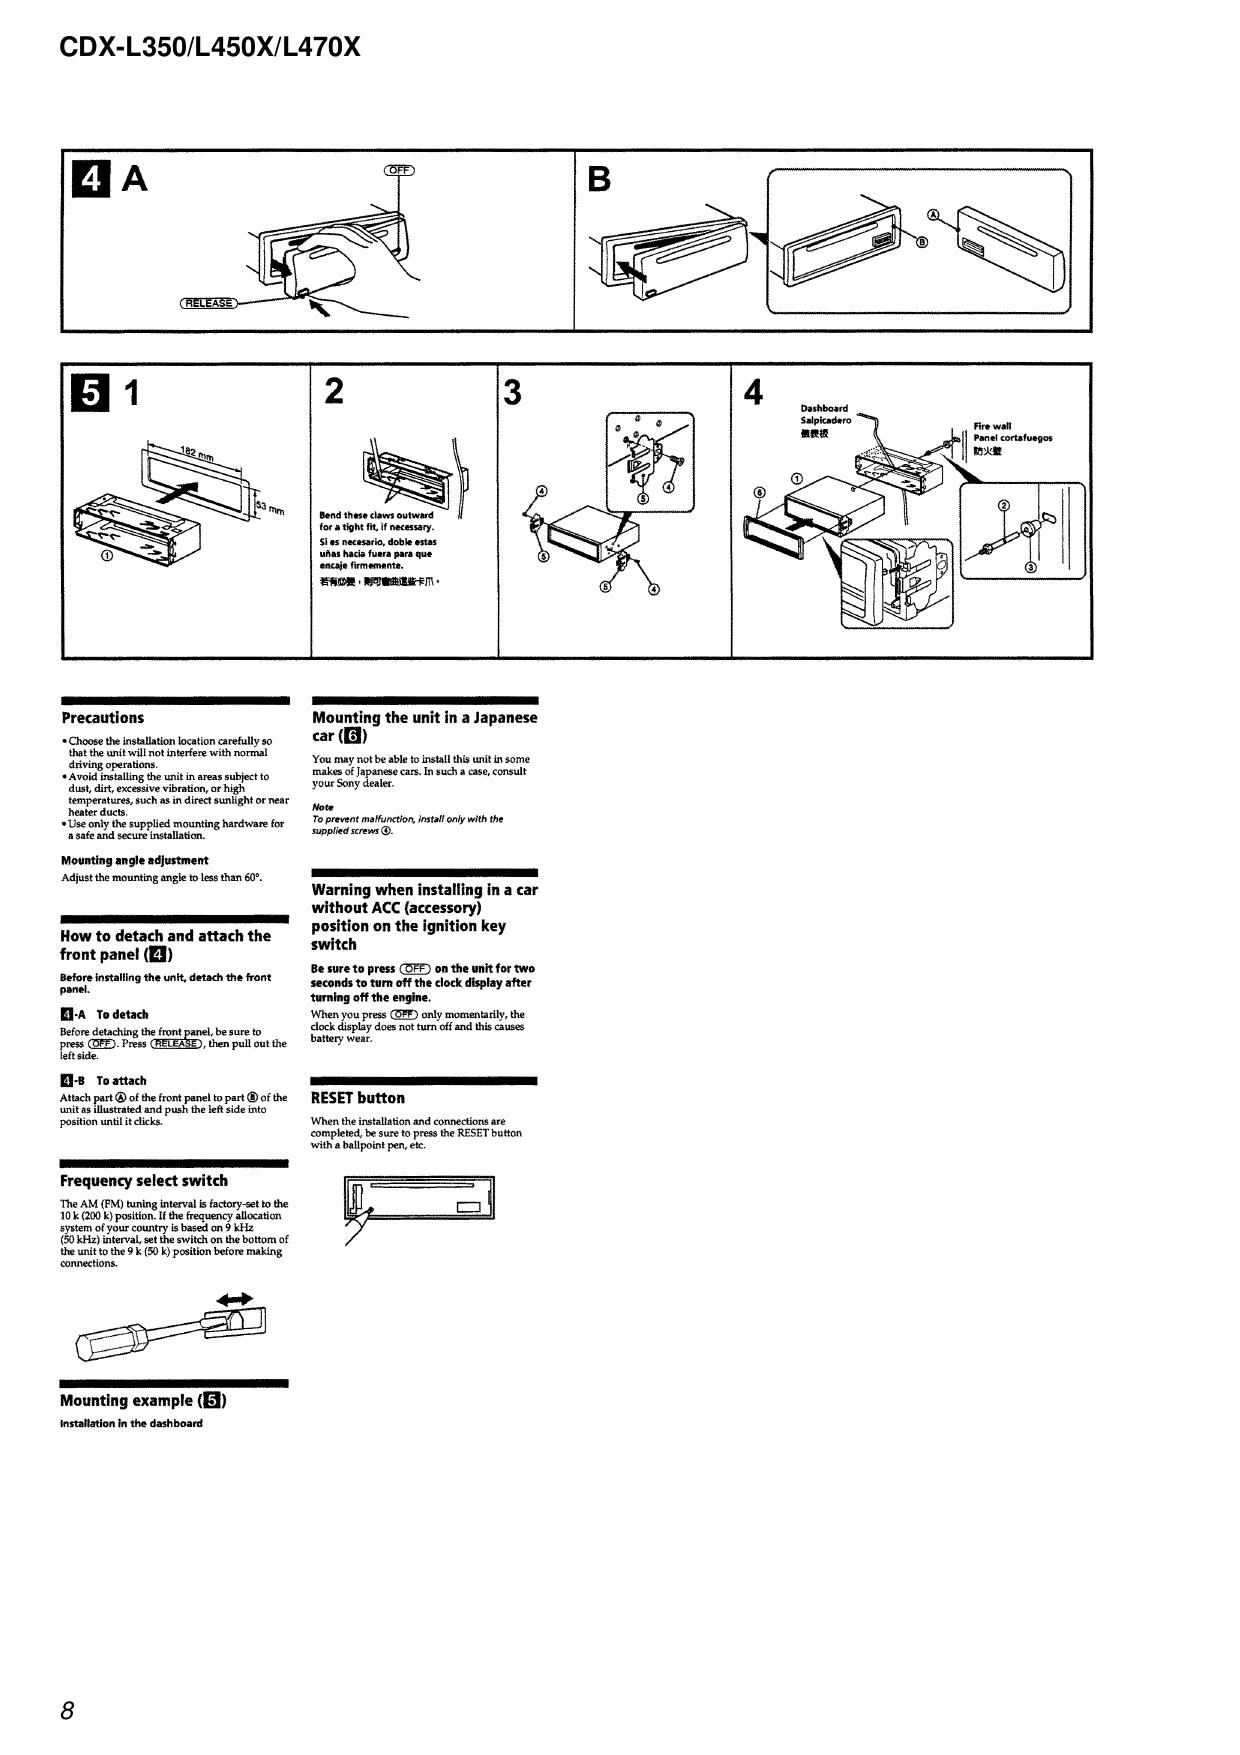 PDF manual for Sony Car Receiver CDX-L350 on sony cdx-gt270mp, sony cdx-gt575up, sony portable cd player, sony cdx-gt260mp, sony single din dvd car stereo,